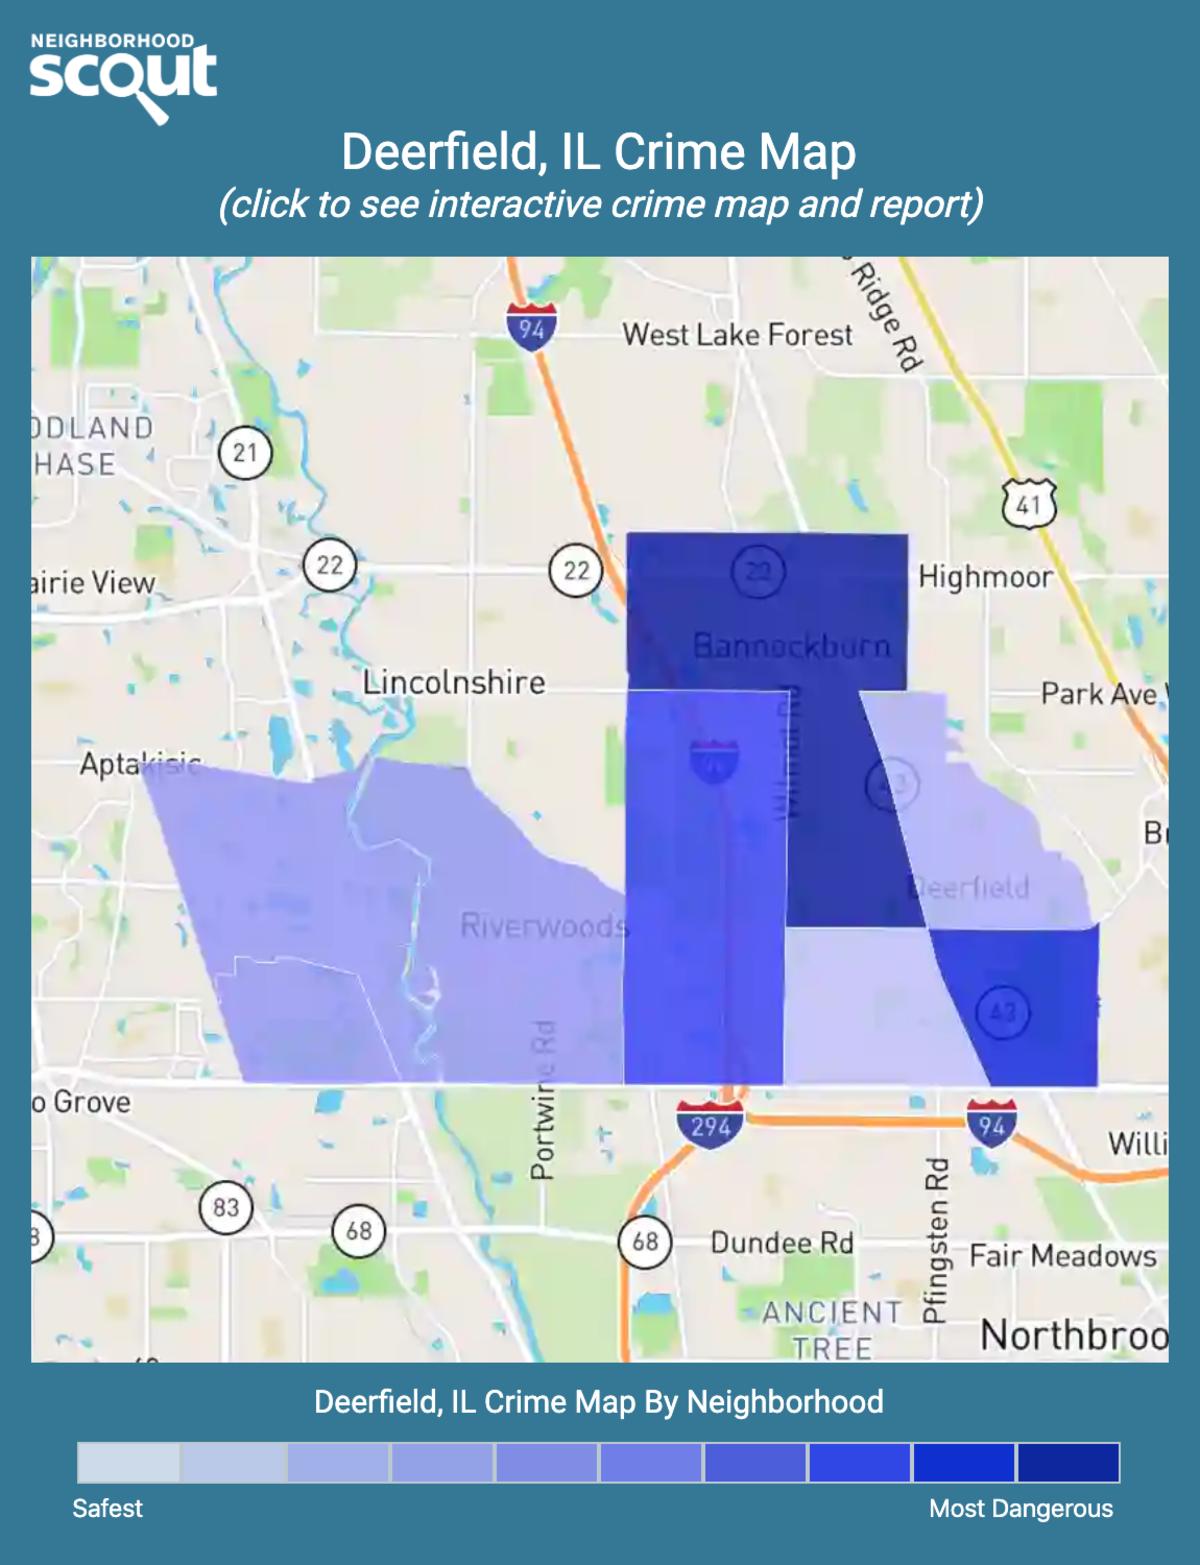 Deerfield, Illinois crime map